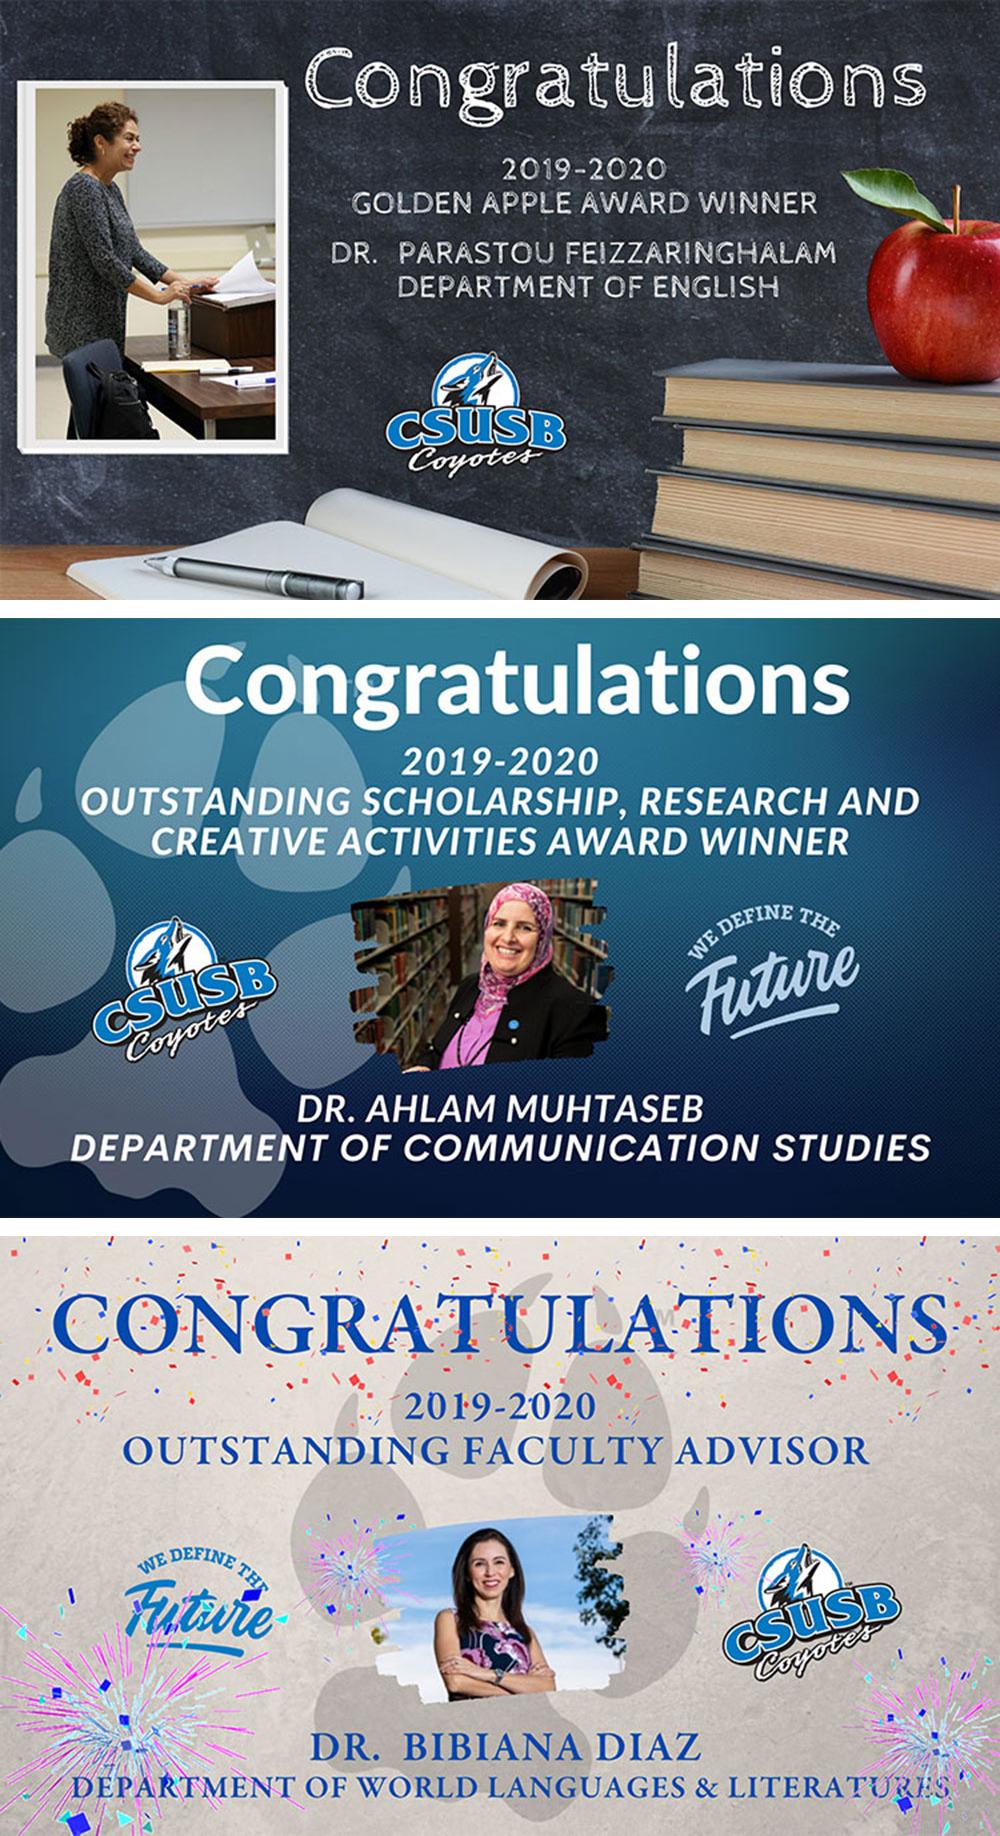 CSUSB faculty awards